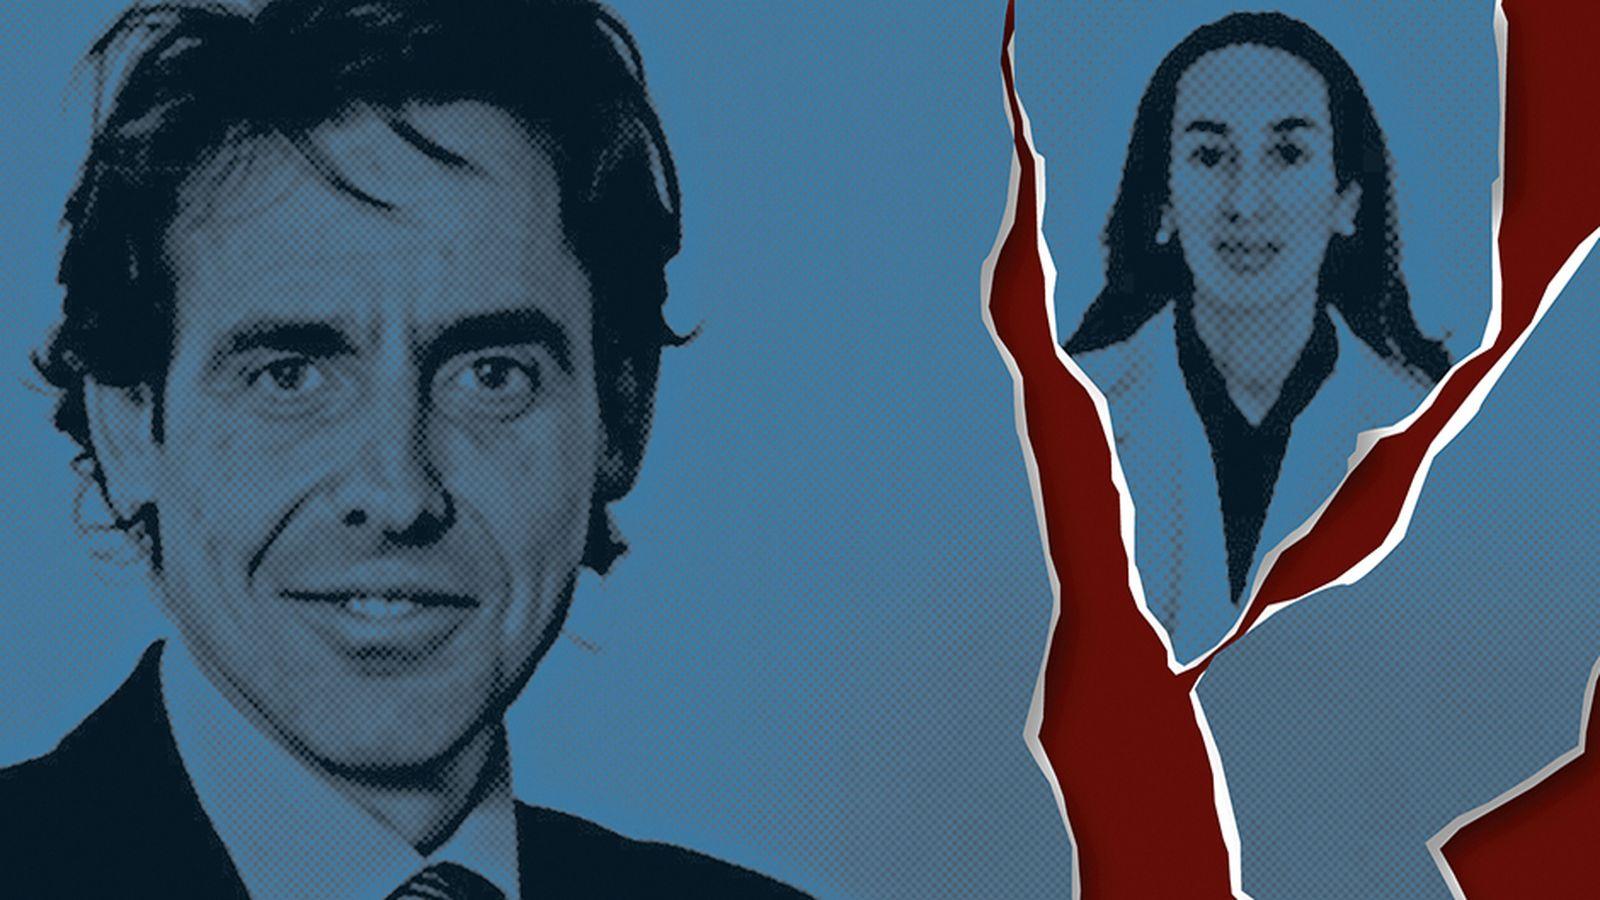 Foto: Javier López Madrid y Elisa Pinto Romero, en un fotomontaje realizado por Vanitatis.